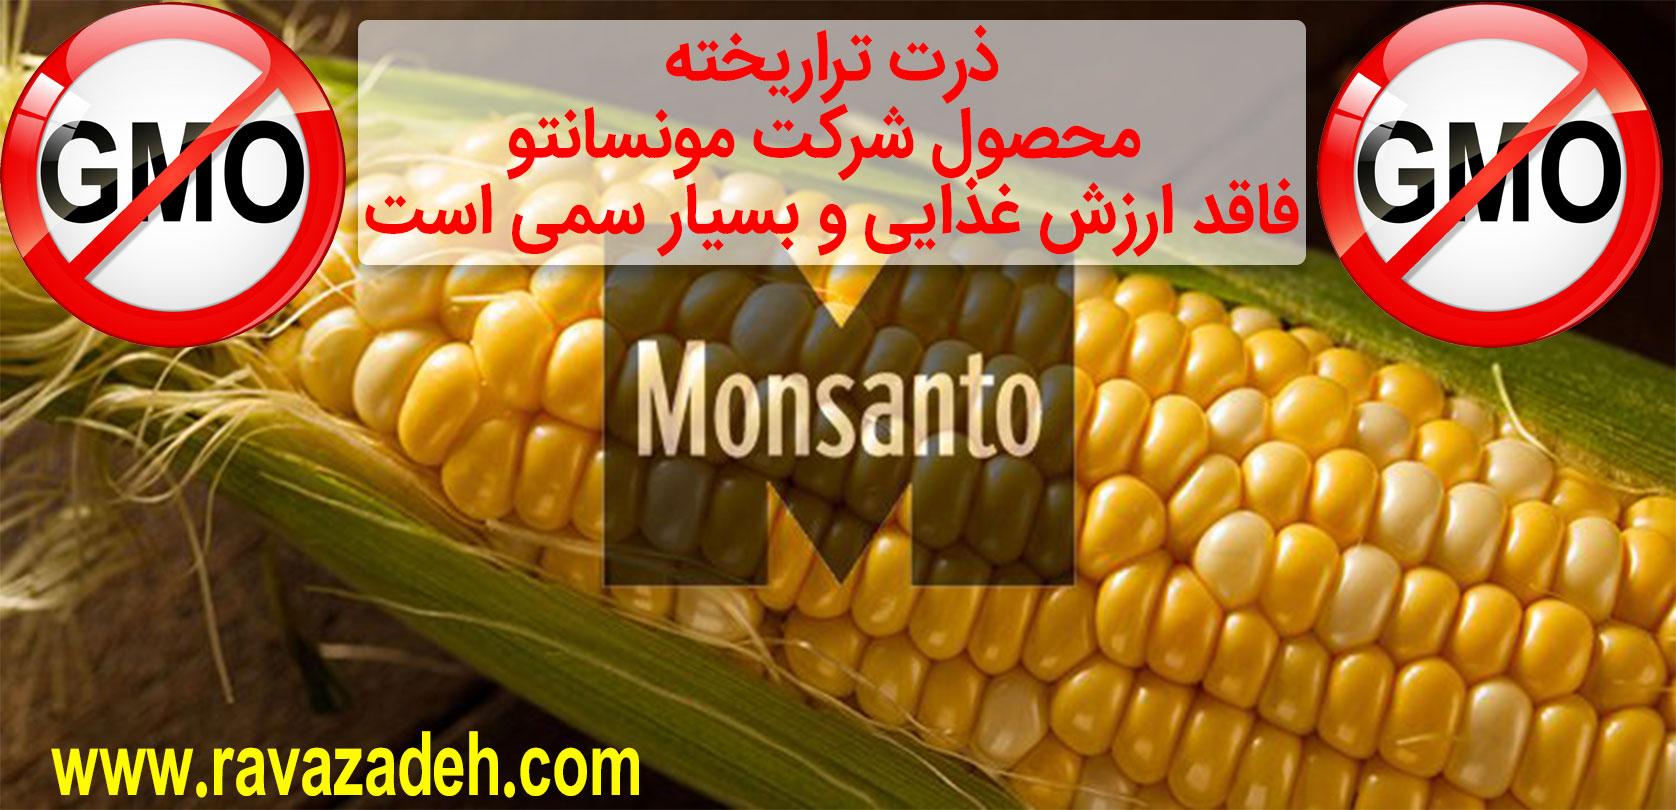 Photo of آزمایشات نشان دادهاند که ذرت تراریخته،محصول شرکت مونسانتو فاقد ارزش غذایی و بسیار سمی است